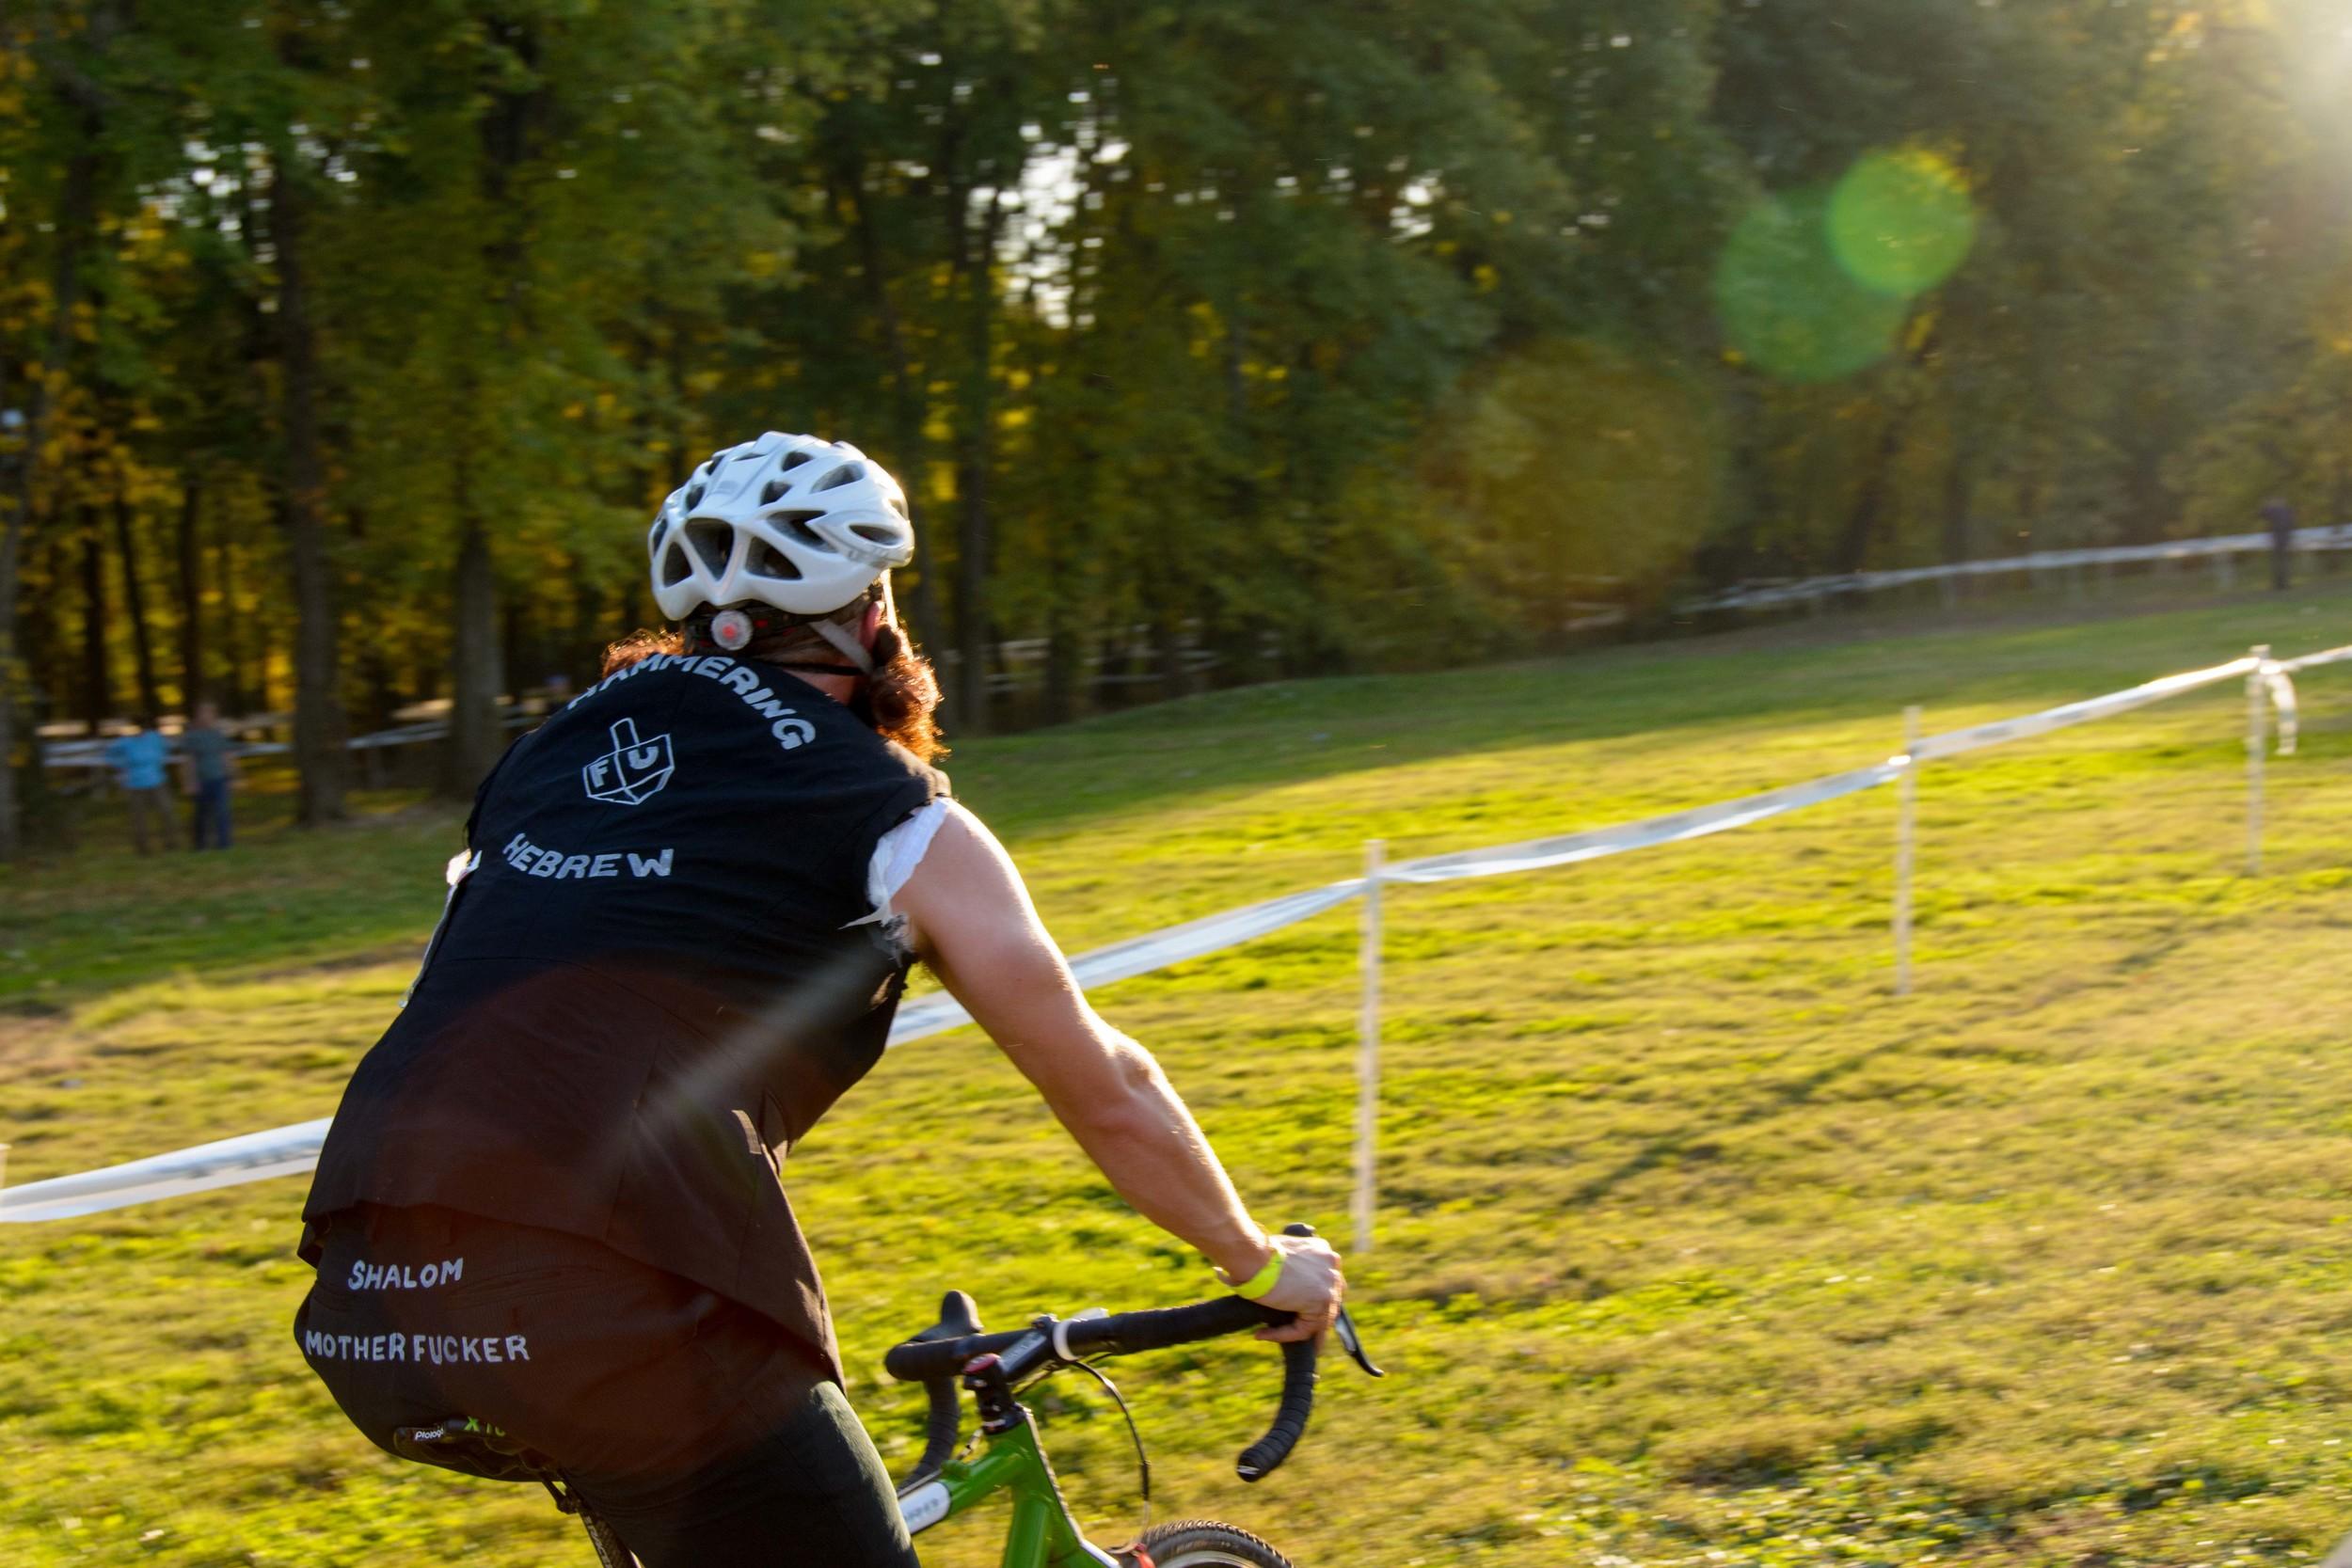 CyclocrossJamie20141025-65.jpg